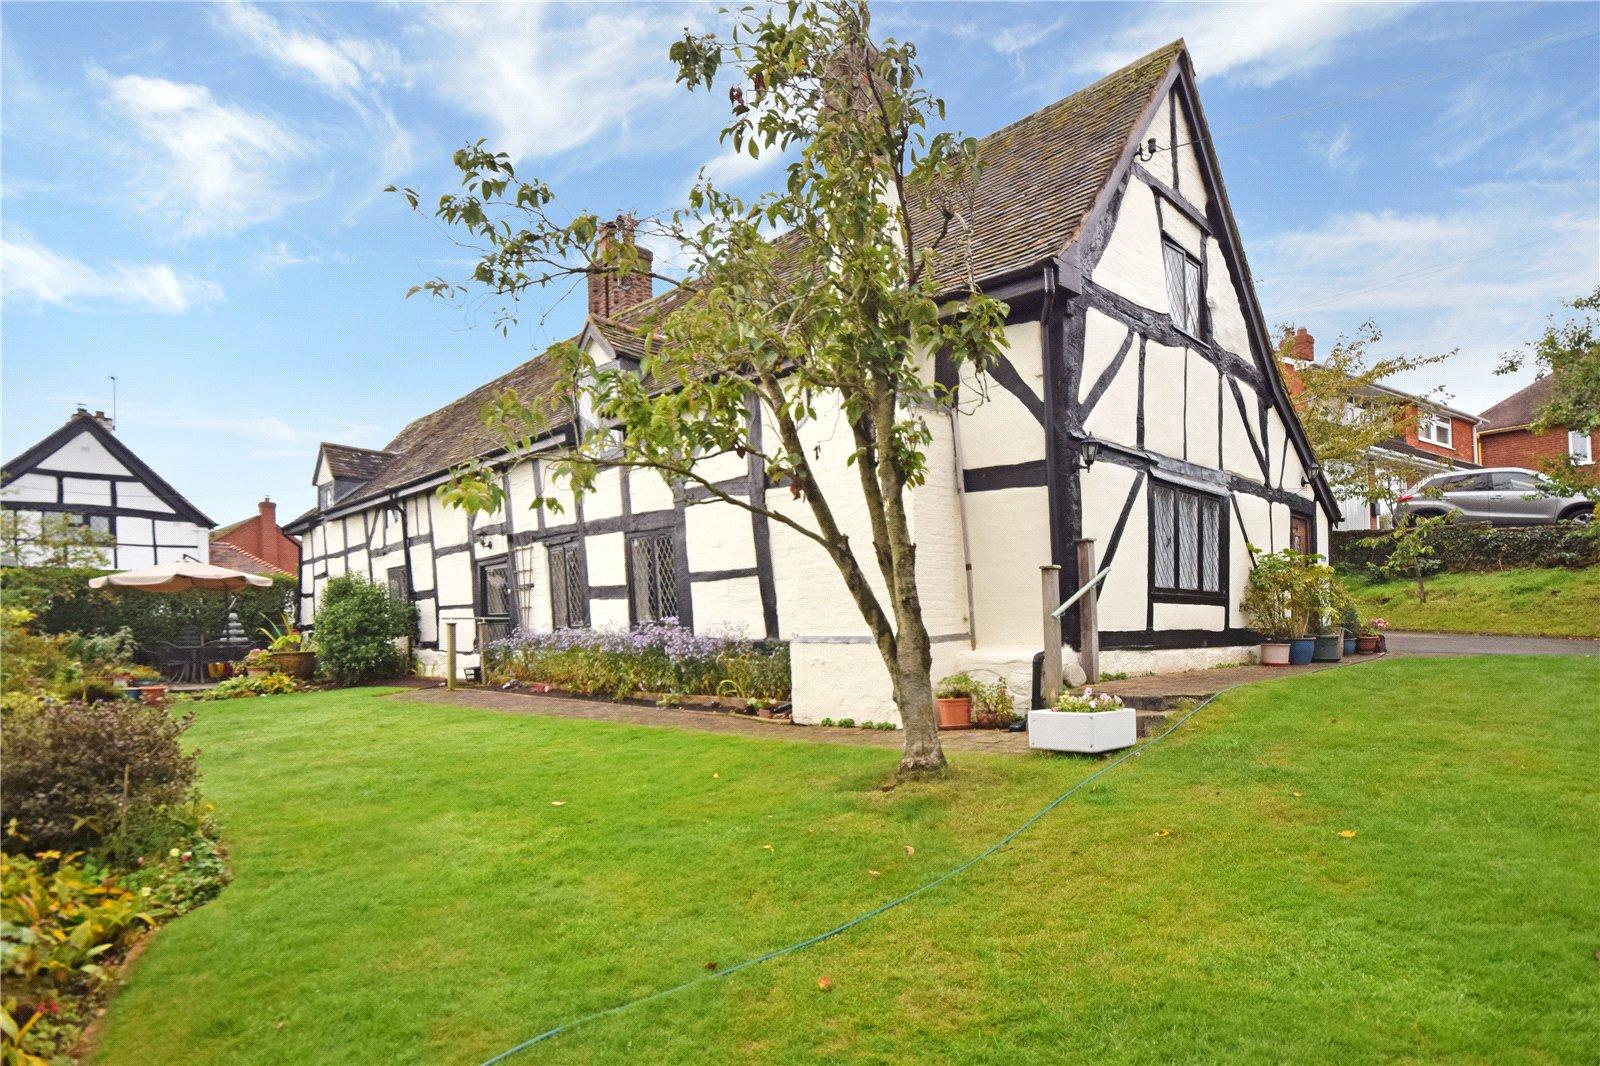 The Old House, Hilton, Bridgnorth, Shropshire, WV15